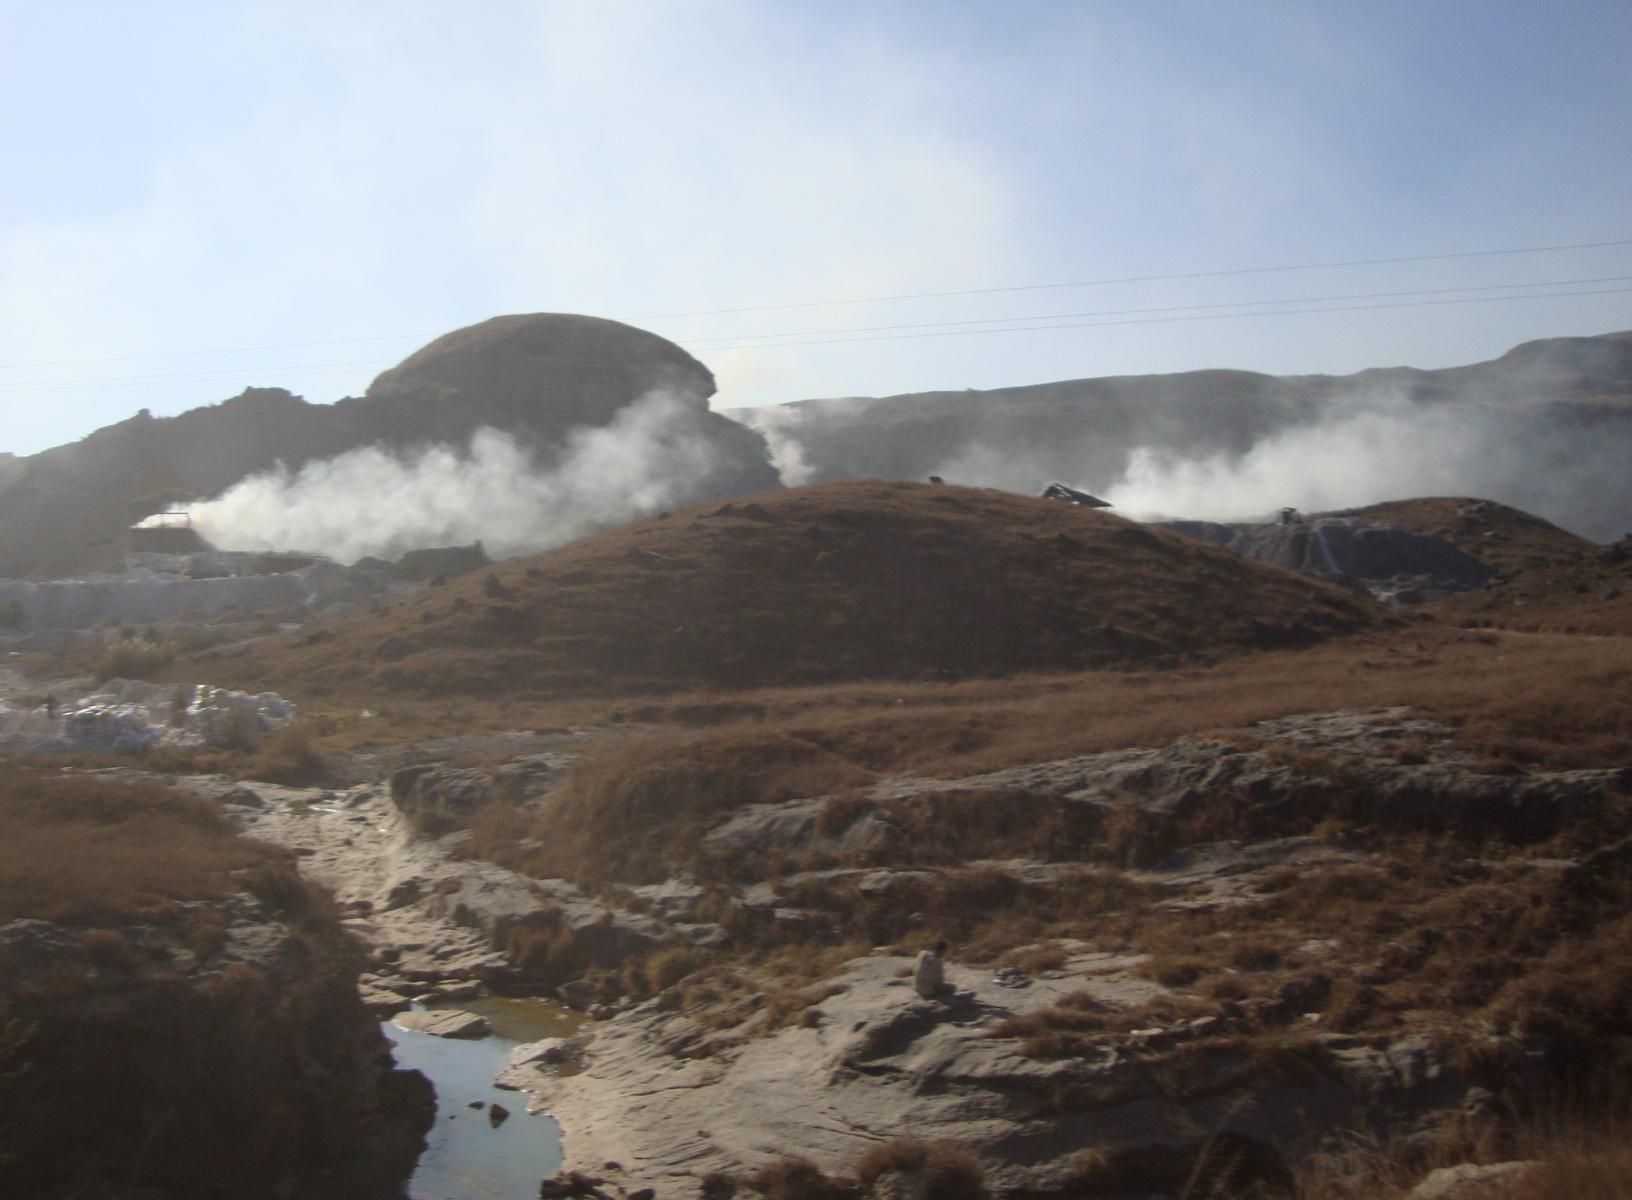 Gravel pit.